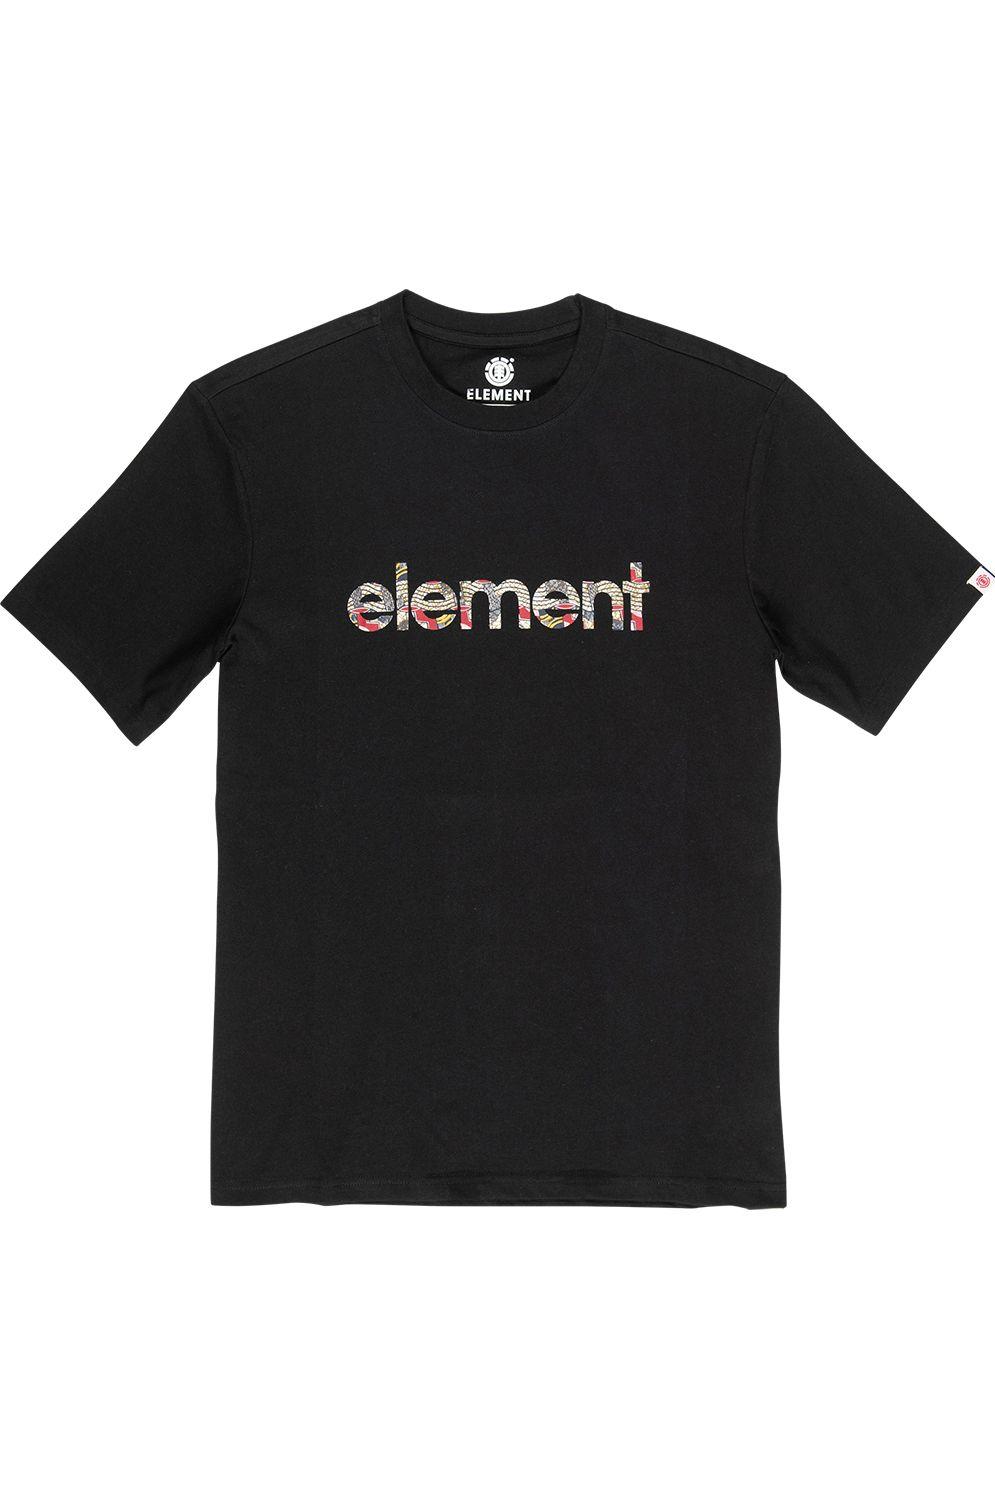 T-Shirt Element ORIGINS Flint Black